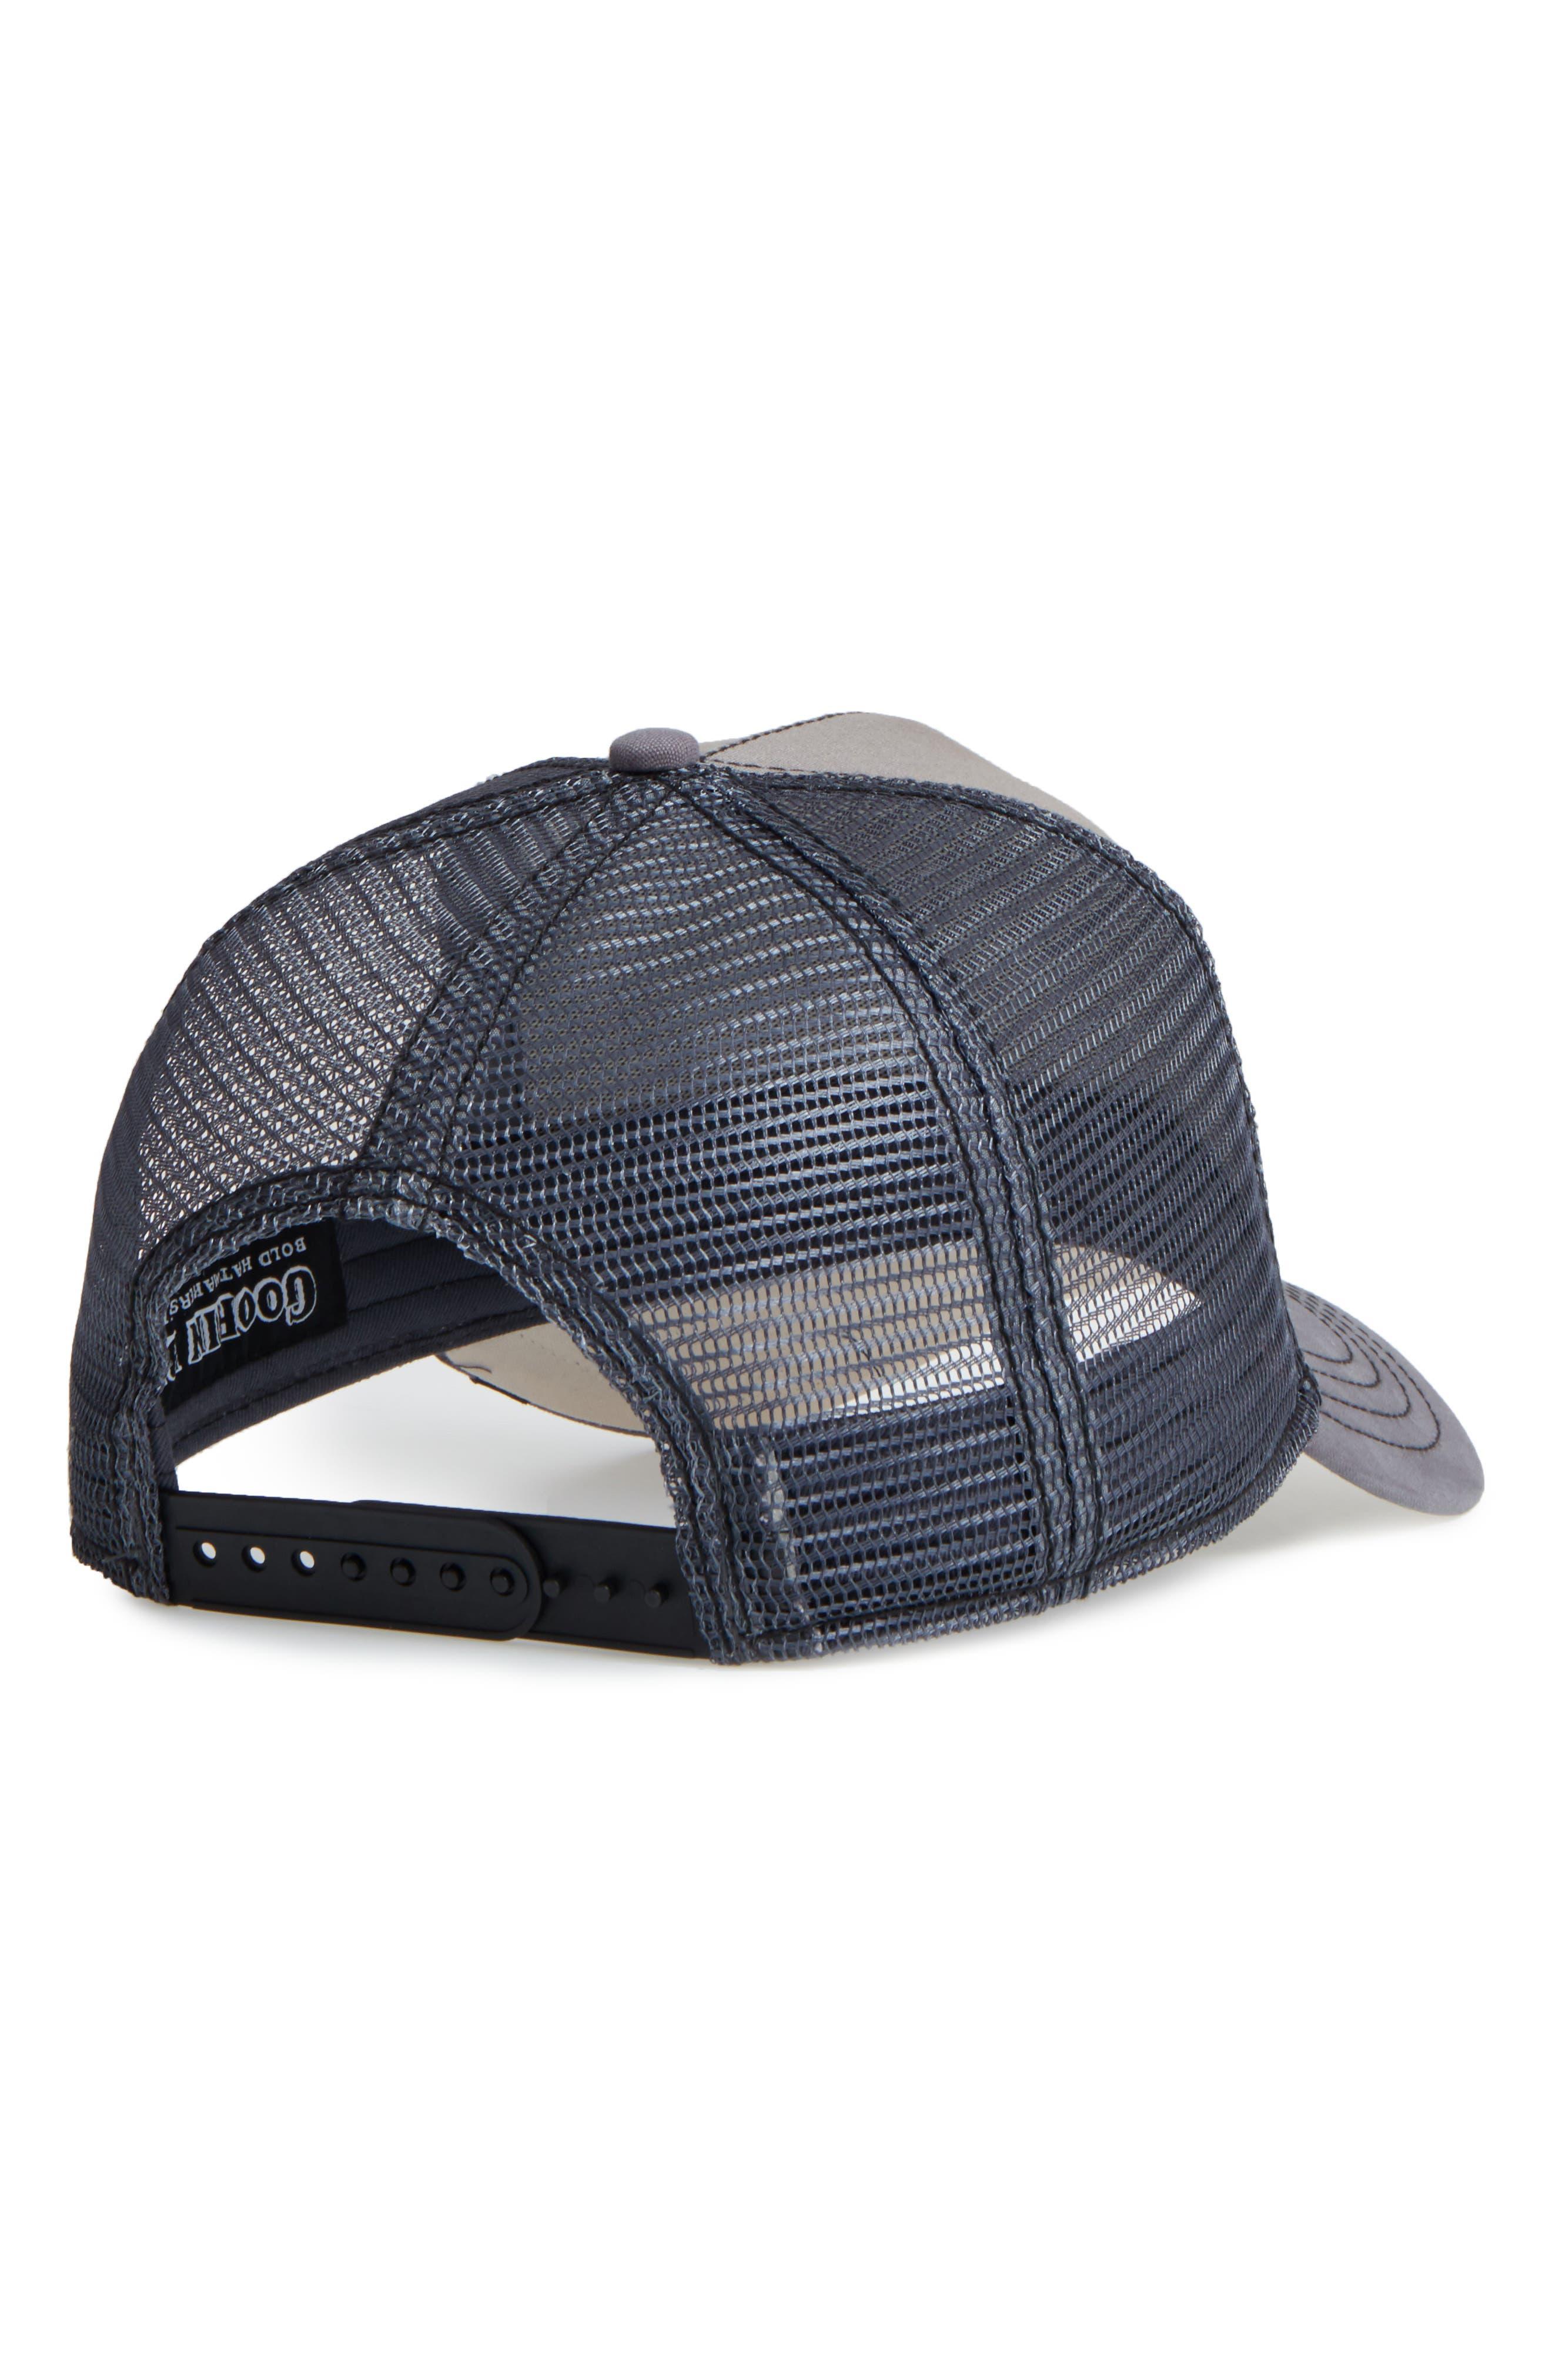 'Shades of Black' Mesh Trucker Hat,                             Alternate thumbnail 2, color,                             GREY